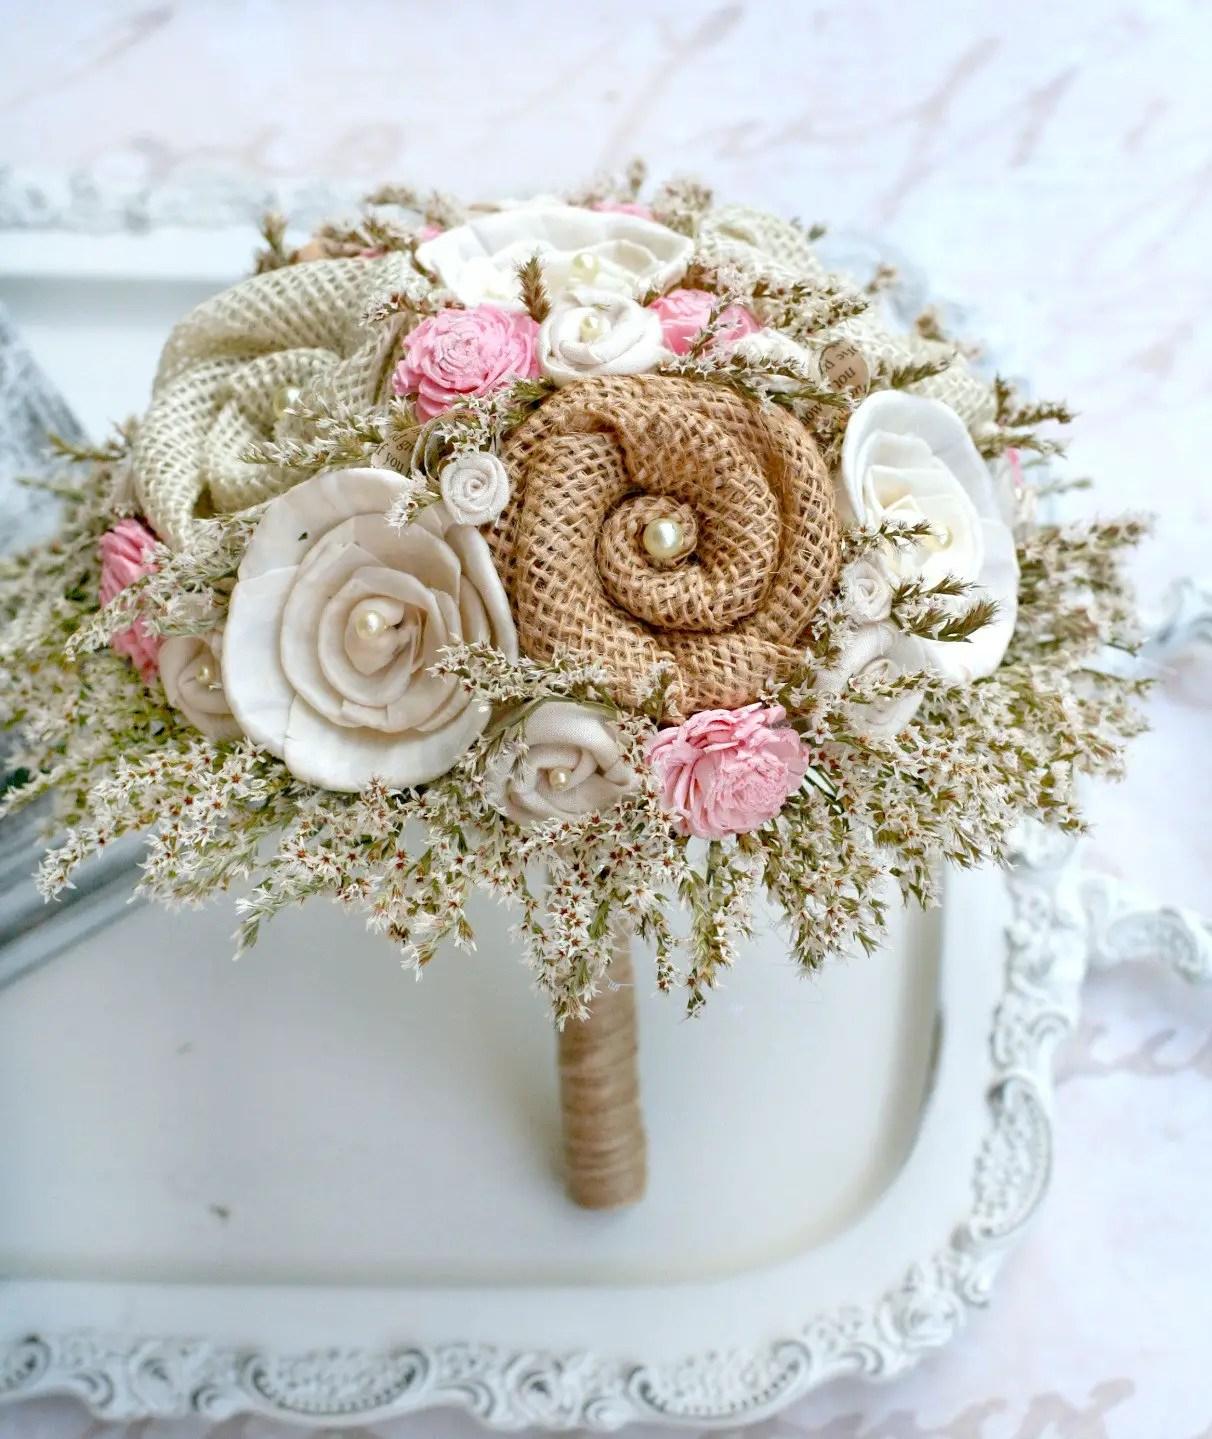 Where to buy sola flowers for weddings ask emmaline izmirmasajfo